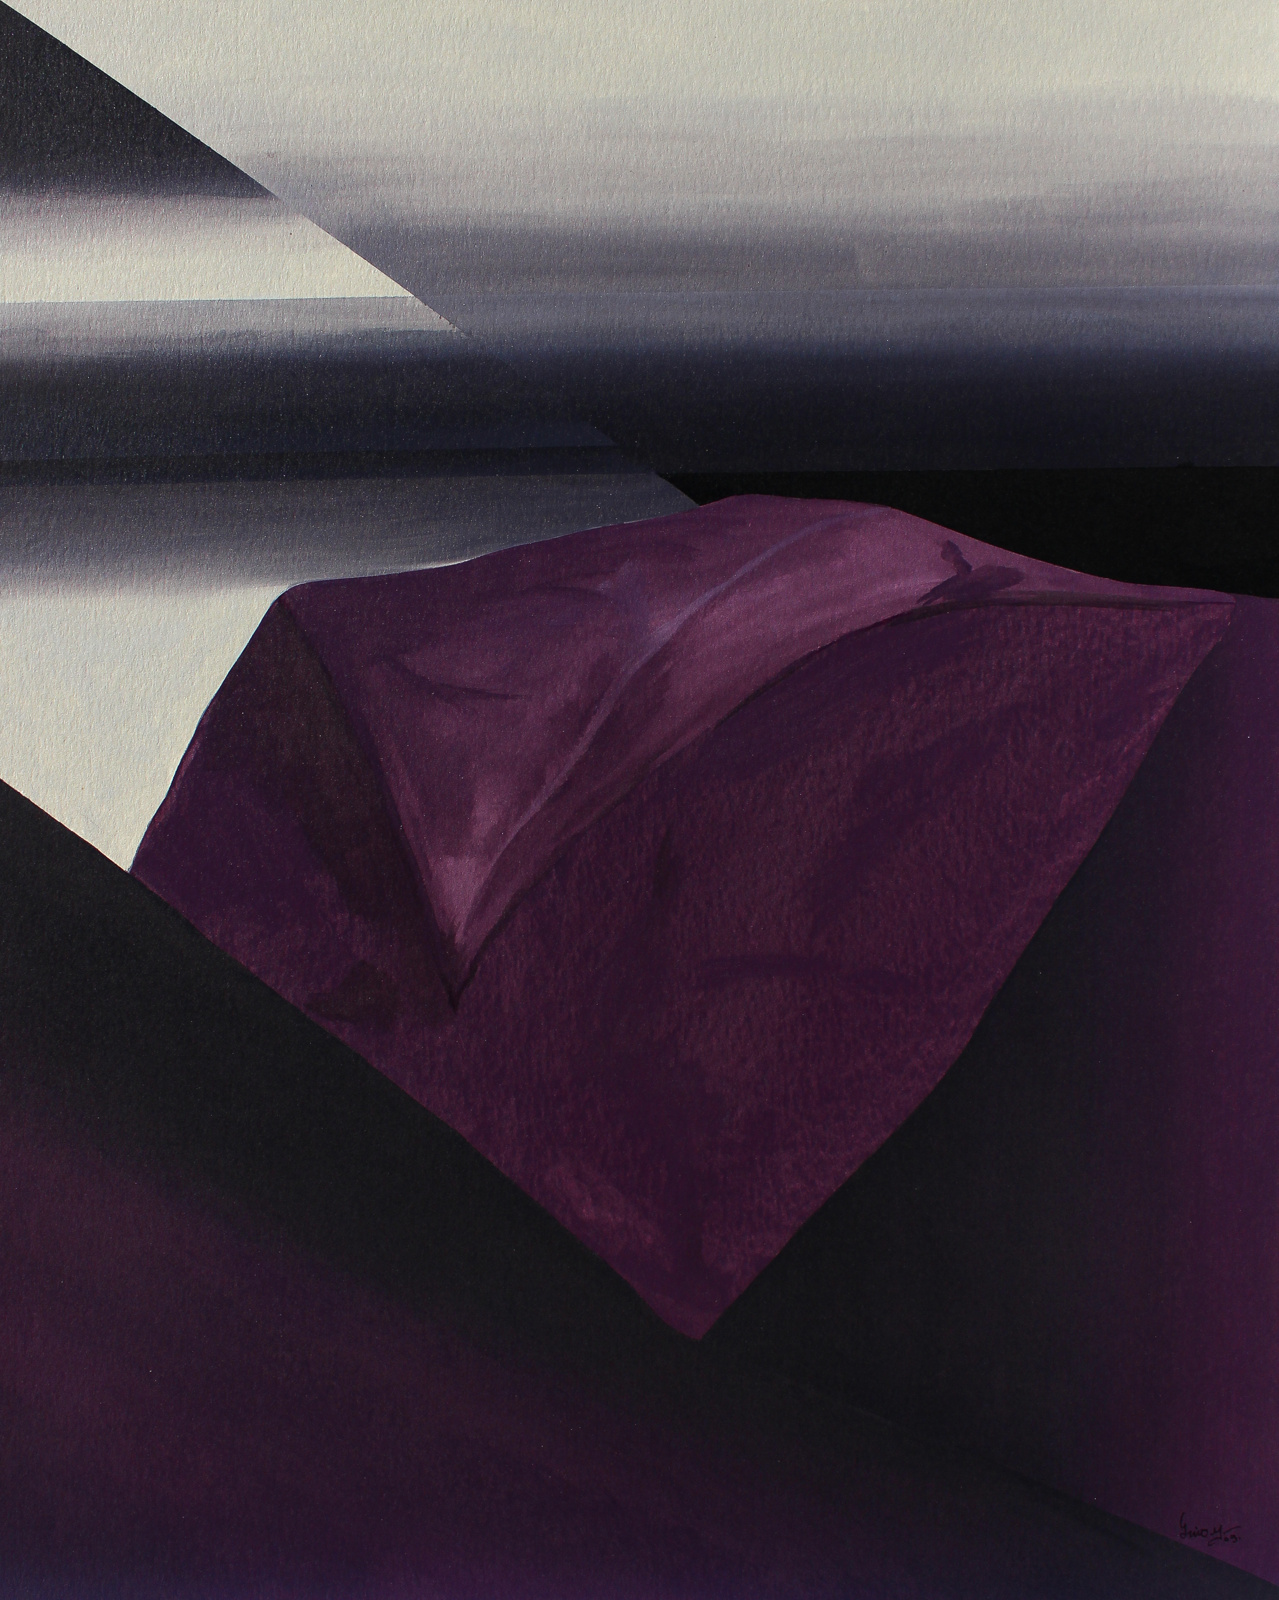 Violet Blanket |  ©  Lino Martinez